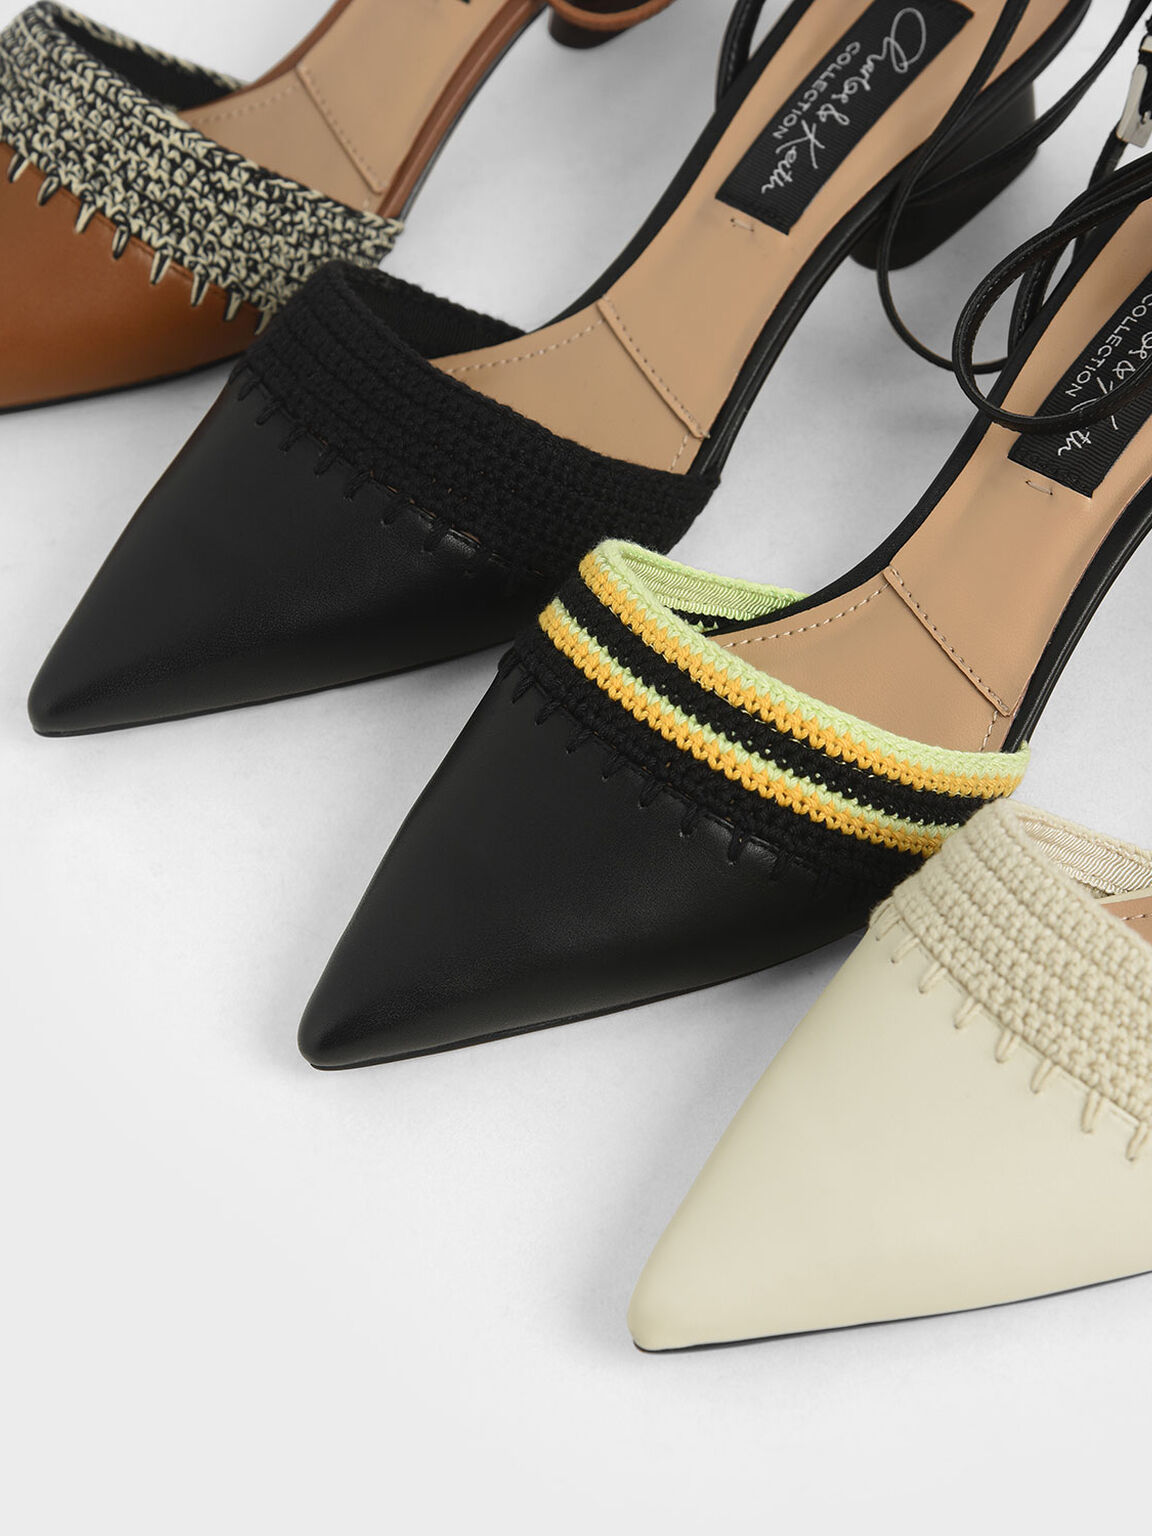 Leather Crochet Pumps, Black, hi-res